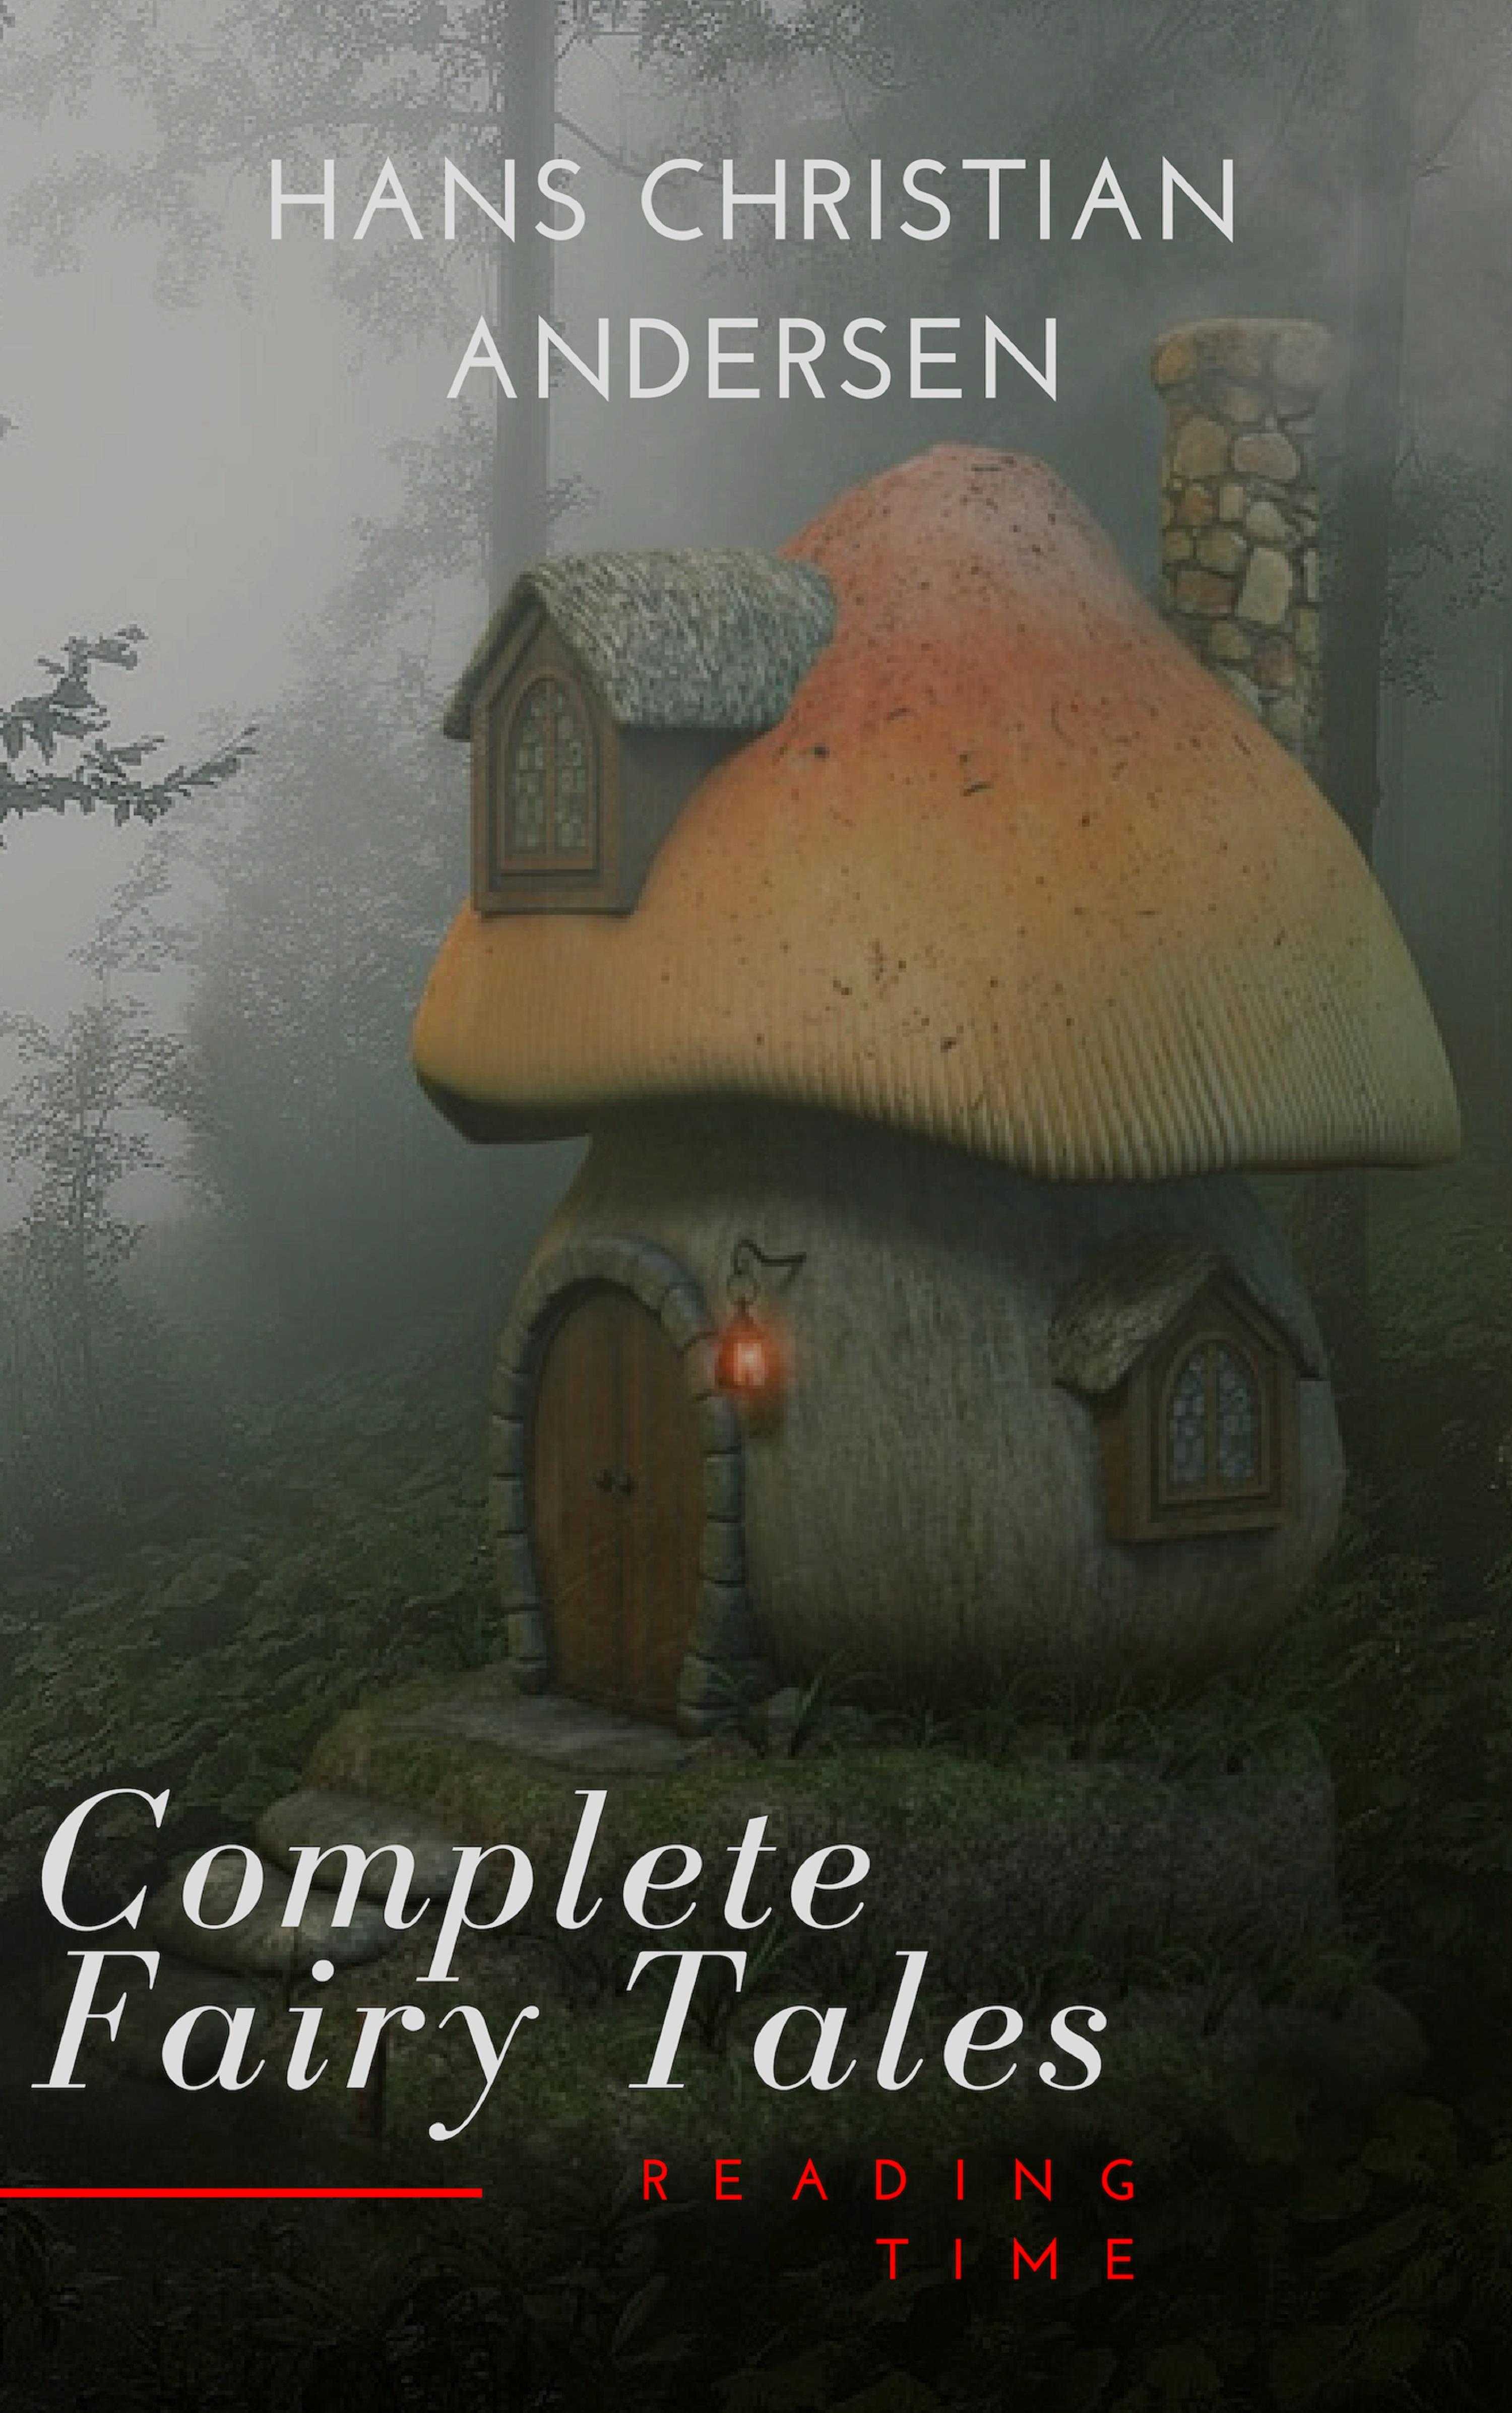 Hans Christian Andersen Complete Fairy Tales of Hans Christian Andersen hans christian andersen fairy tales of hans christian andersen cronos classics